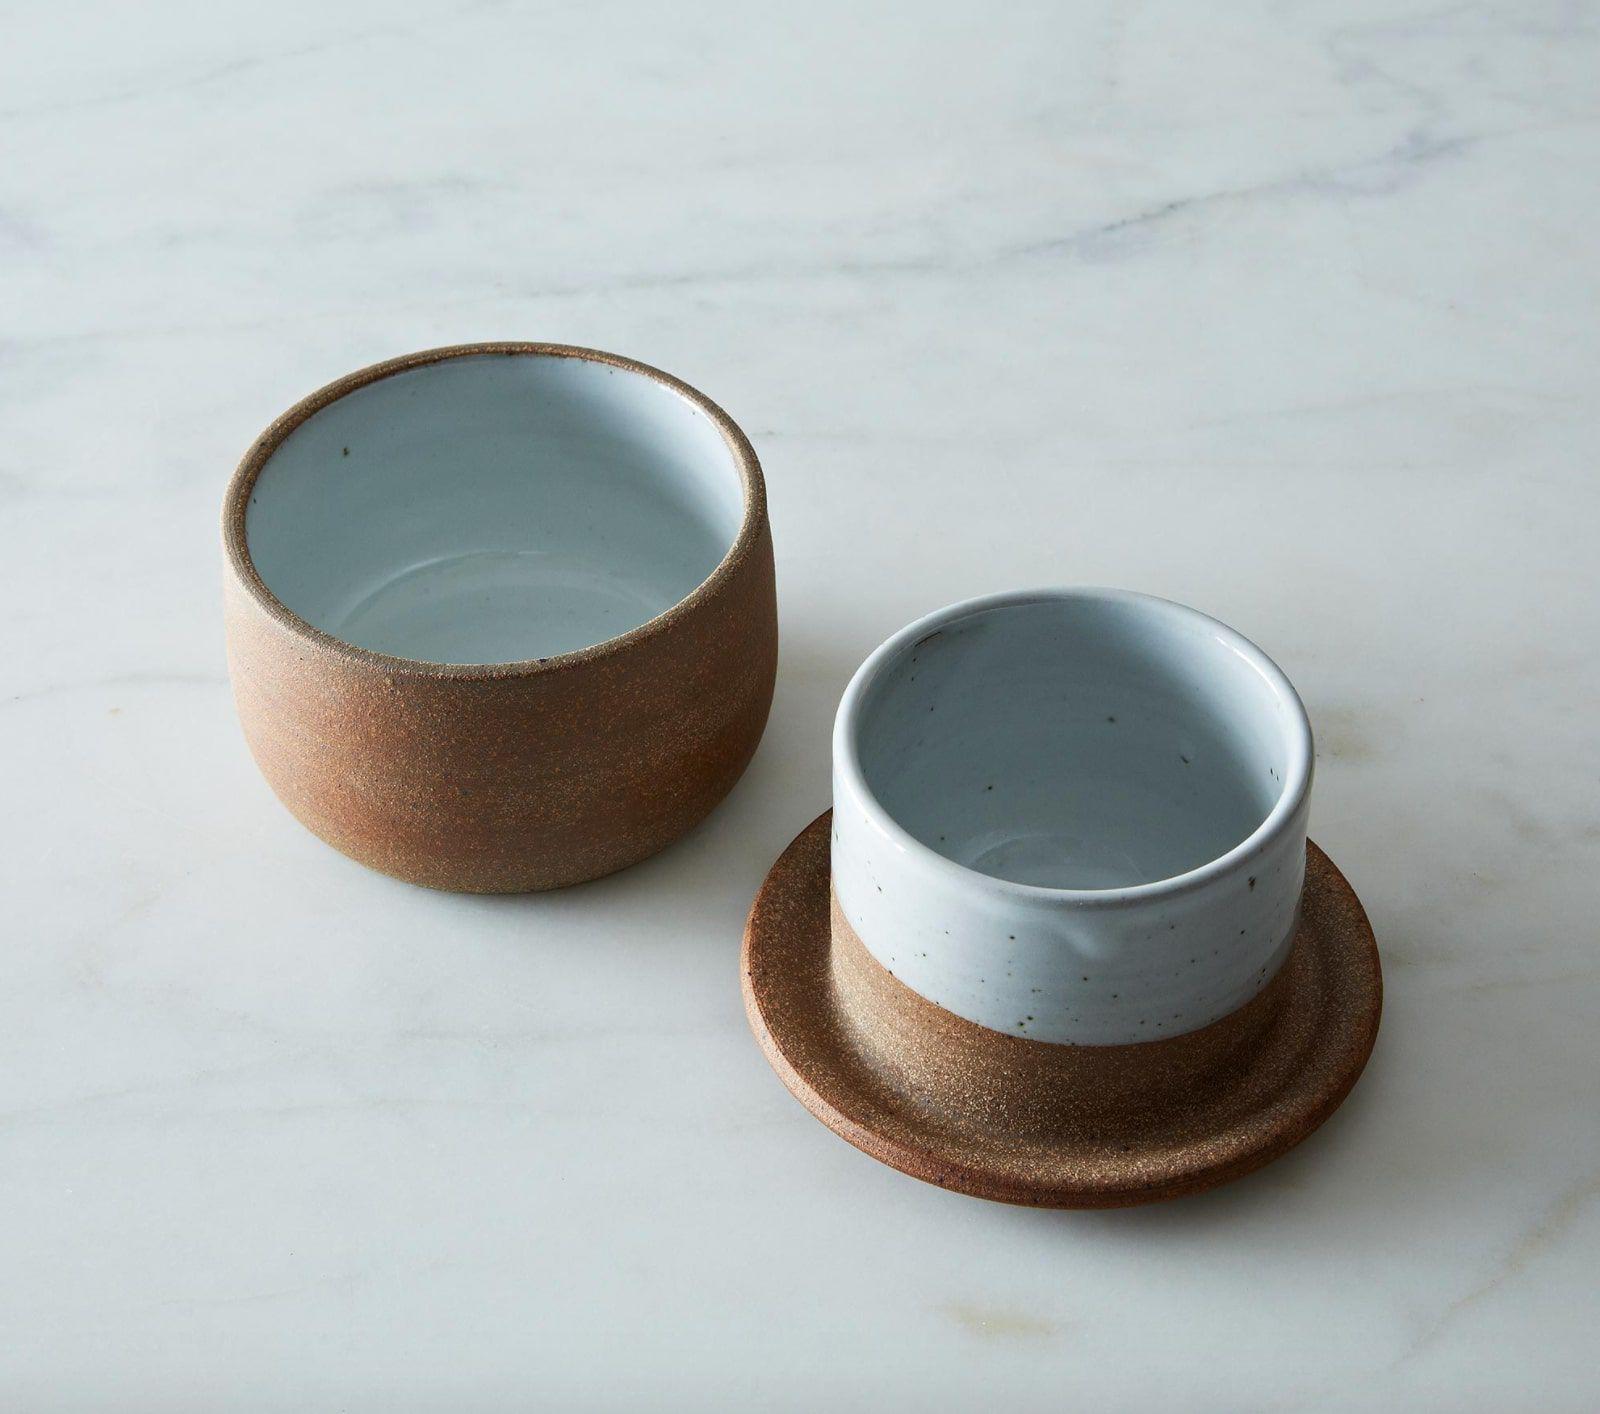 sawyer-ceramics-french-ceramic-butter-keeper